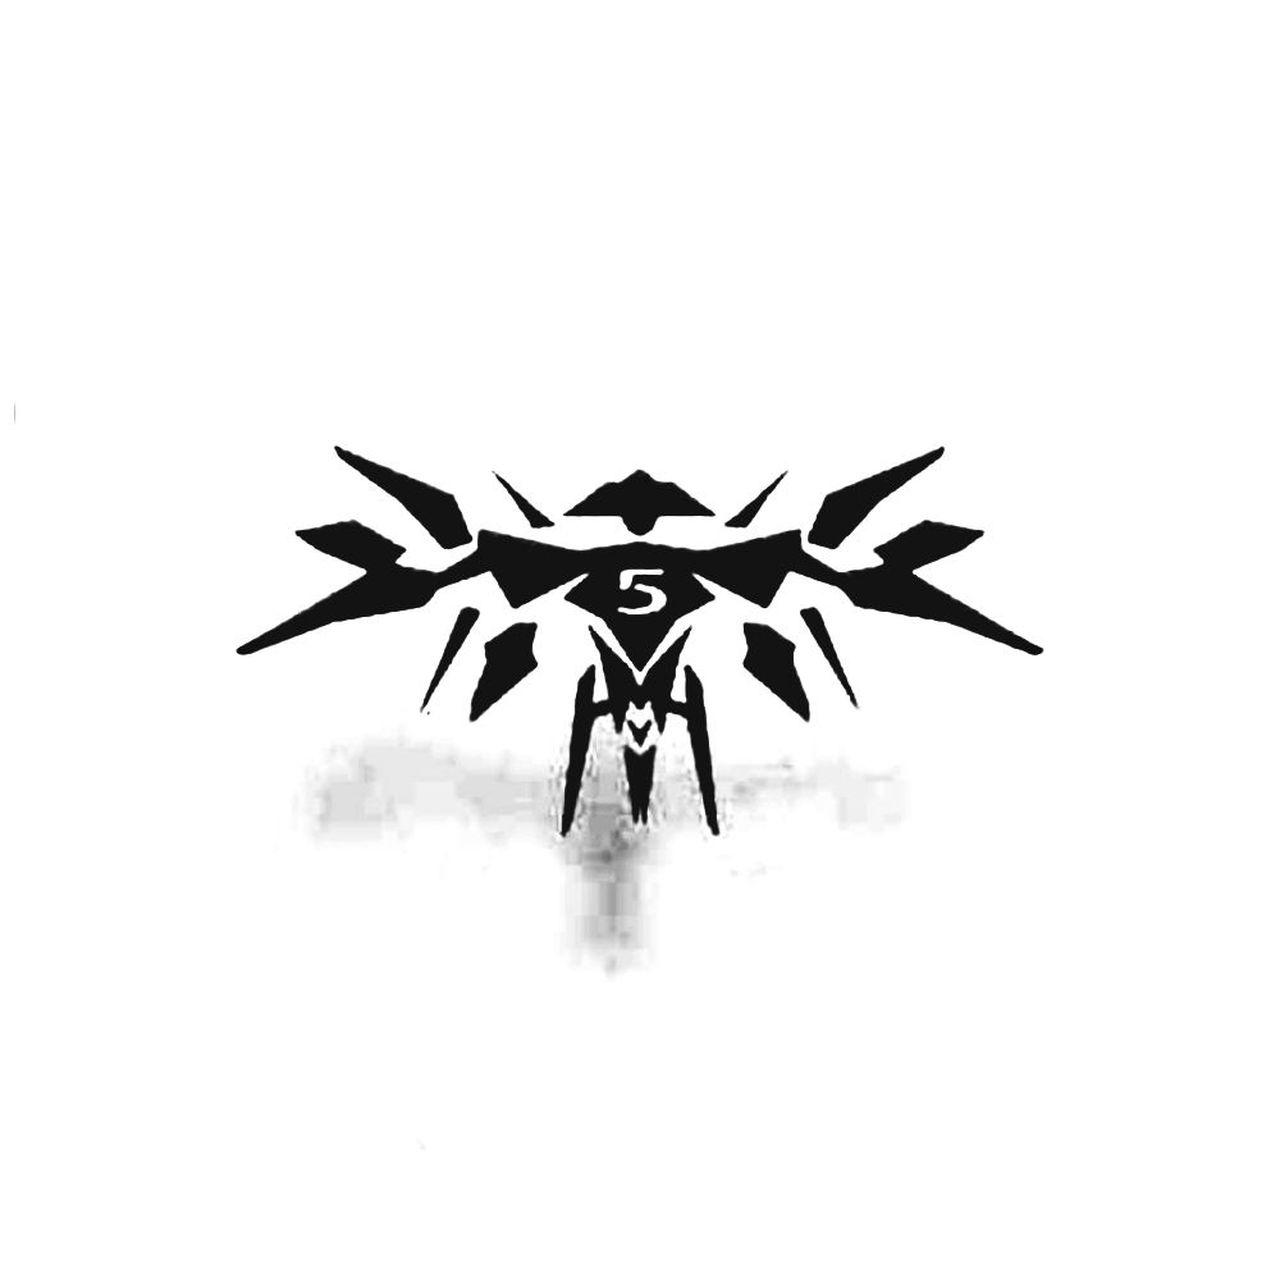 Halo 5 Guardian Minimalist Decal Sticker.